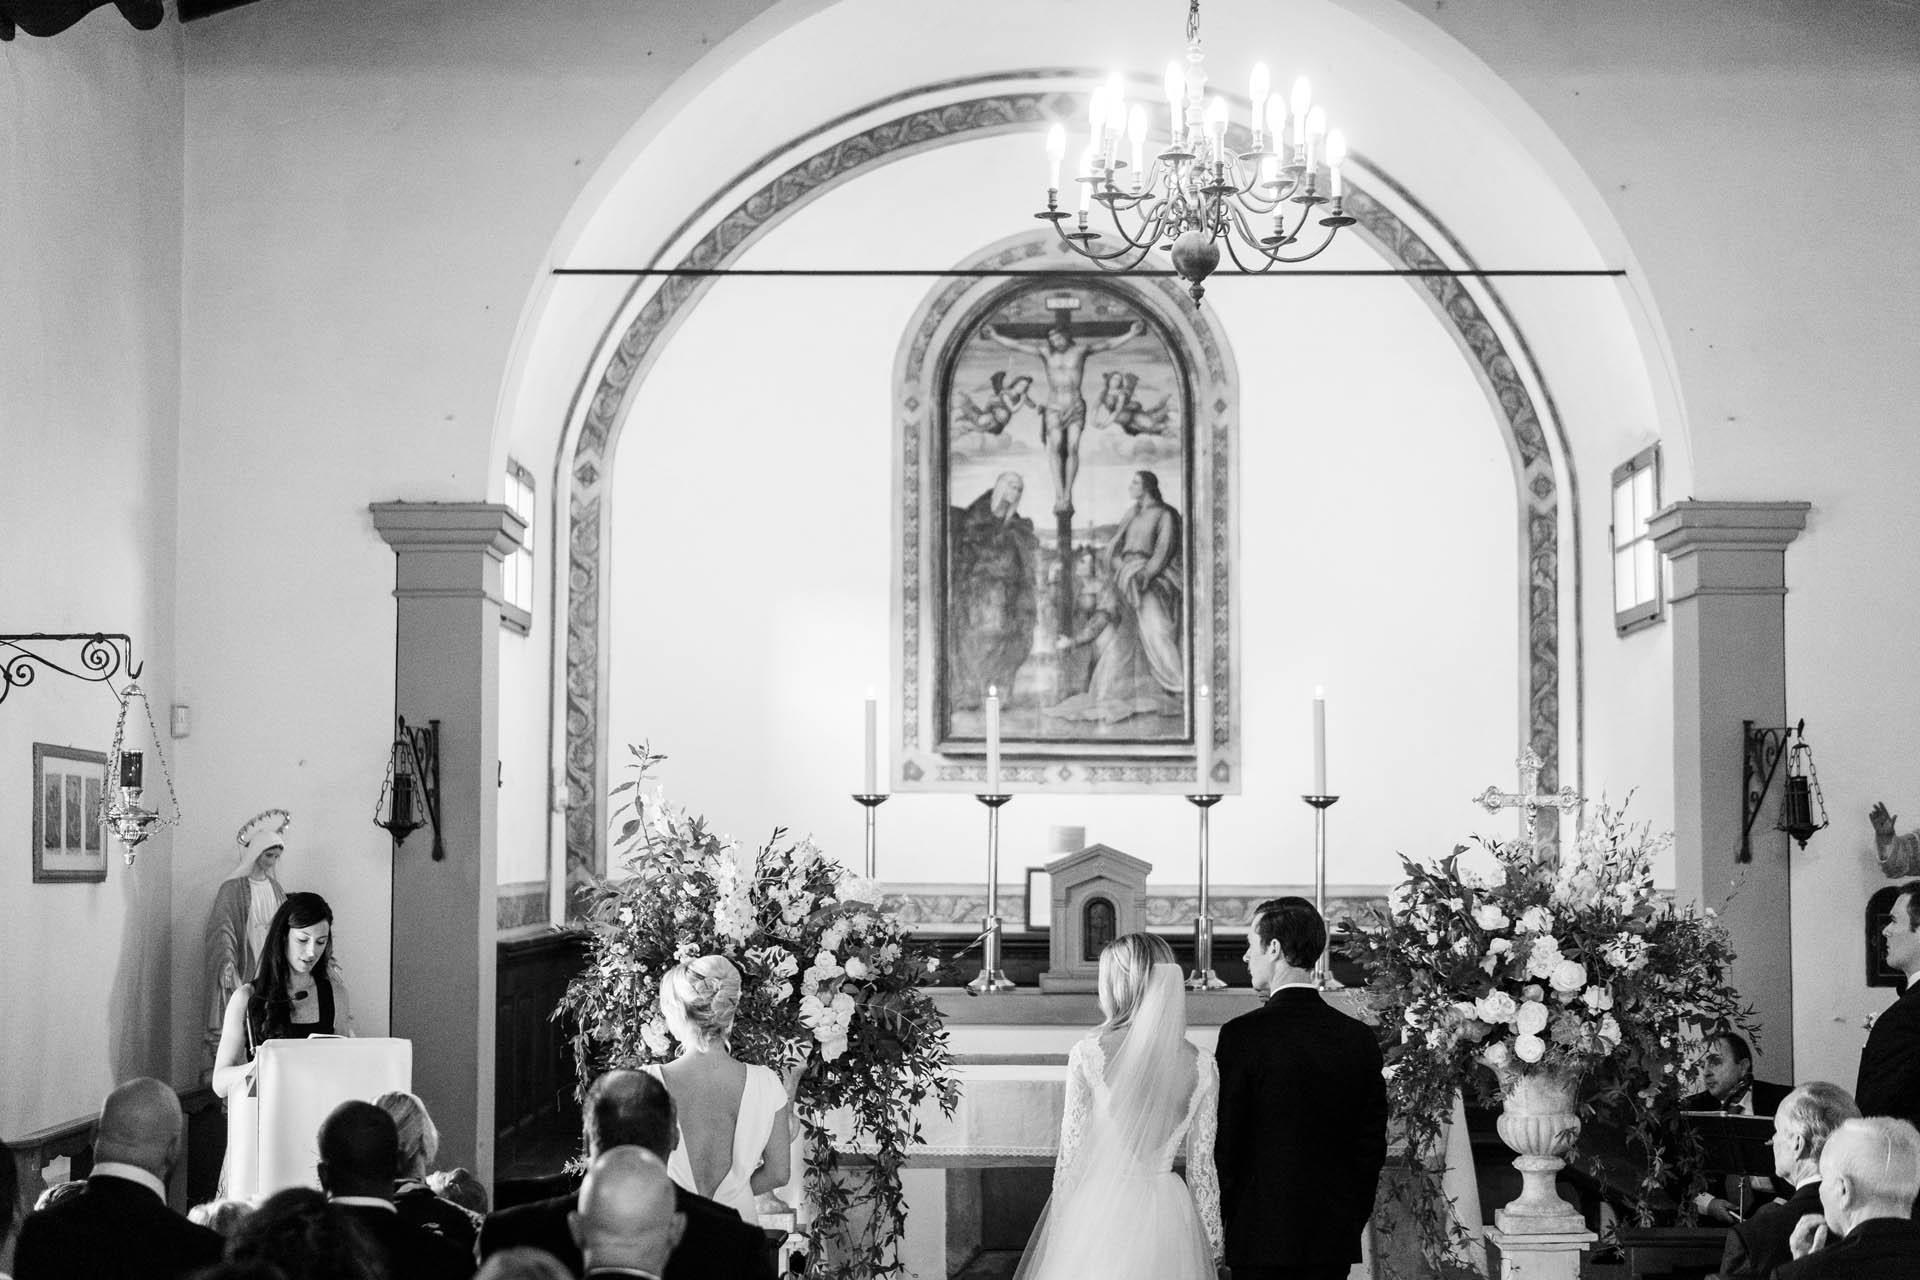 - 45 :: Intimate elegance: an intimate wedding at Il Borro :: Luxury wedding photography - 44 ::  - 45